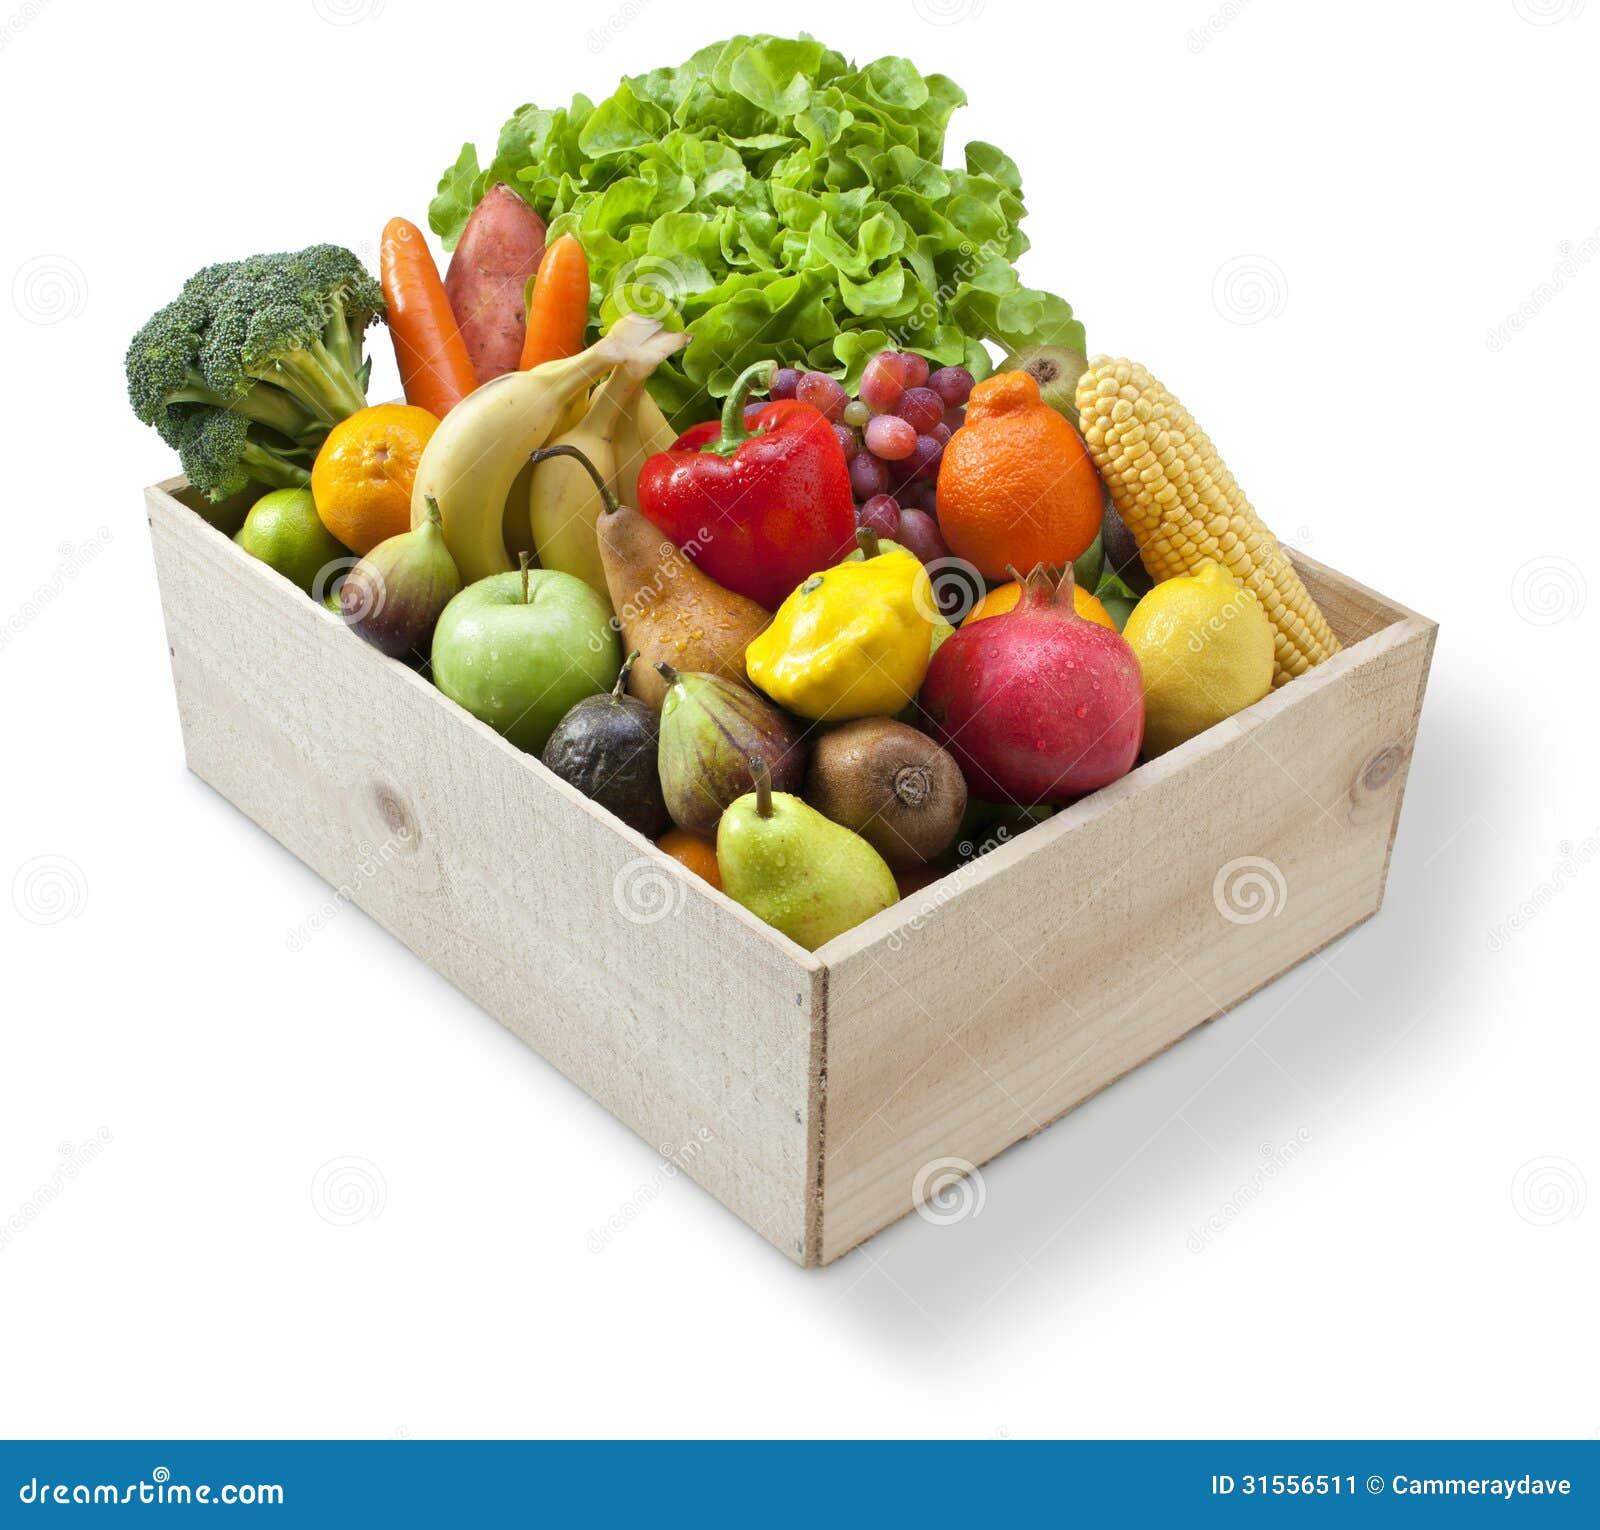 Wood Box Food Fruit Vegetables Stock Image Image Of Harvest